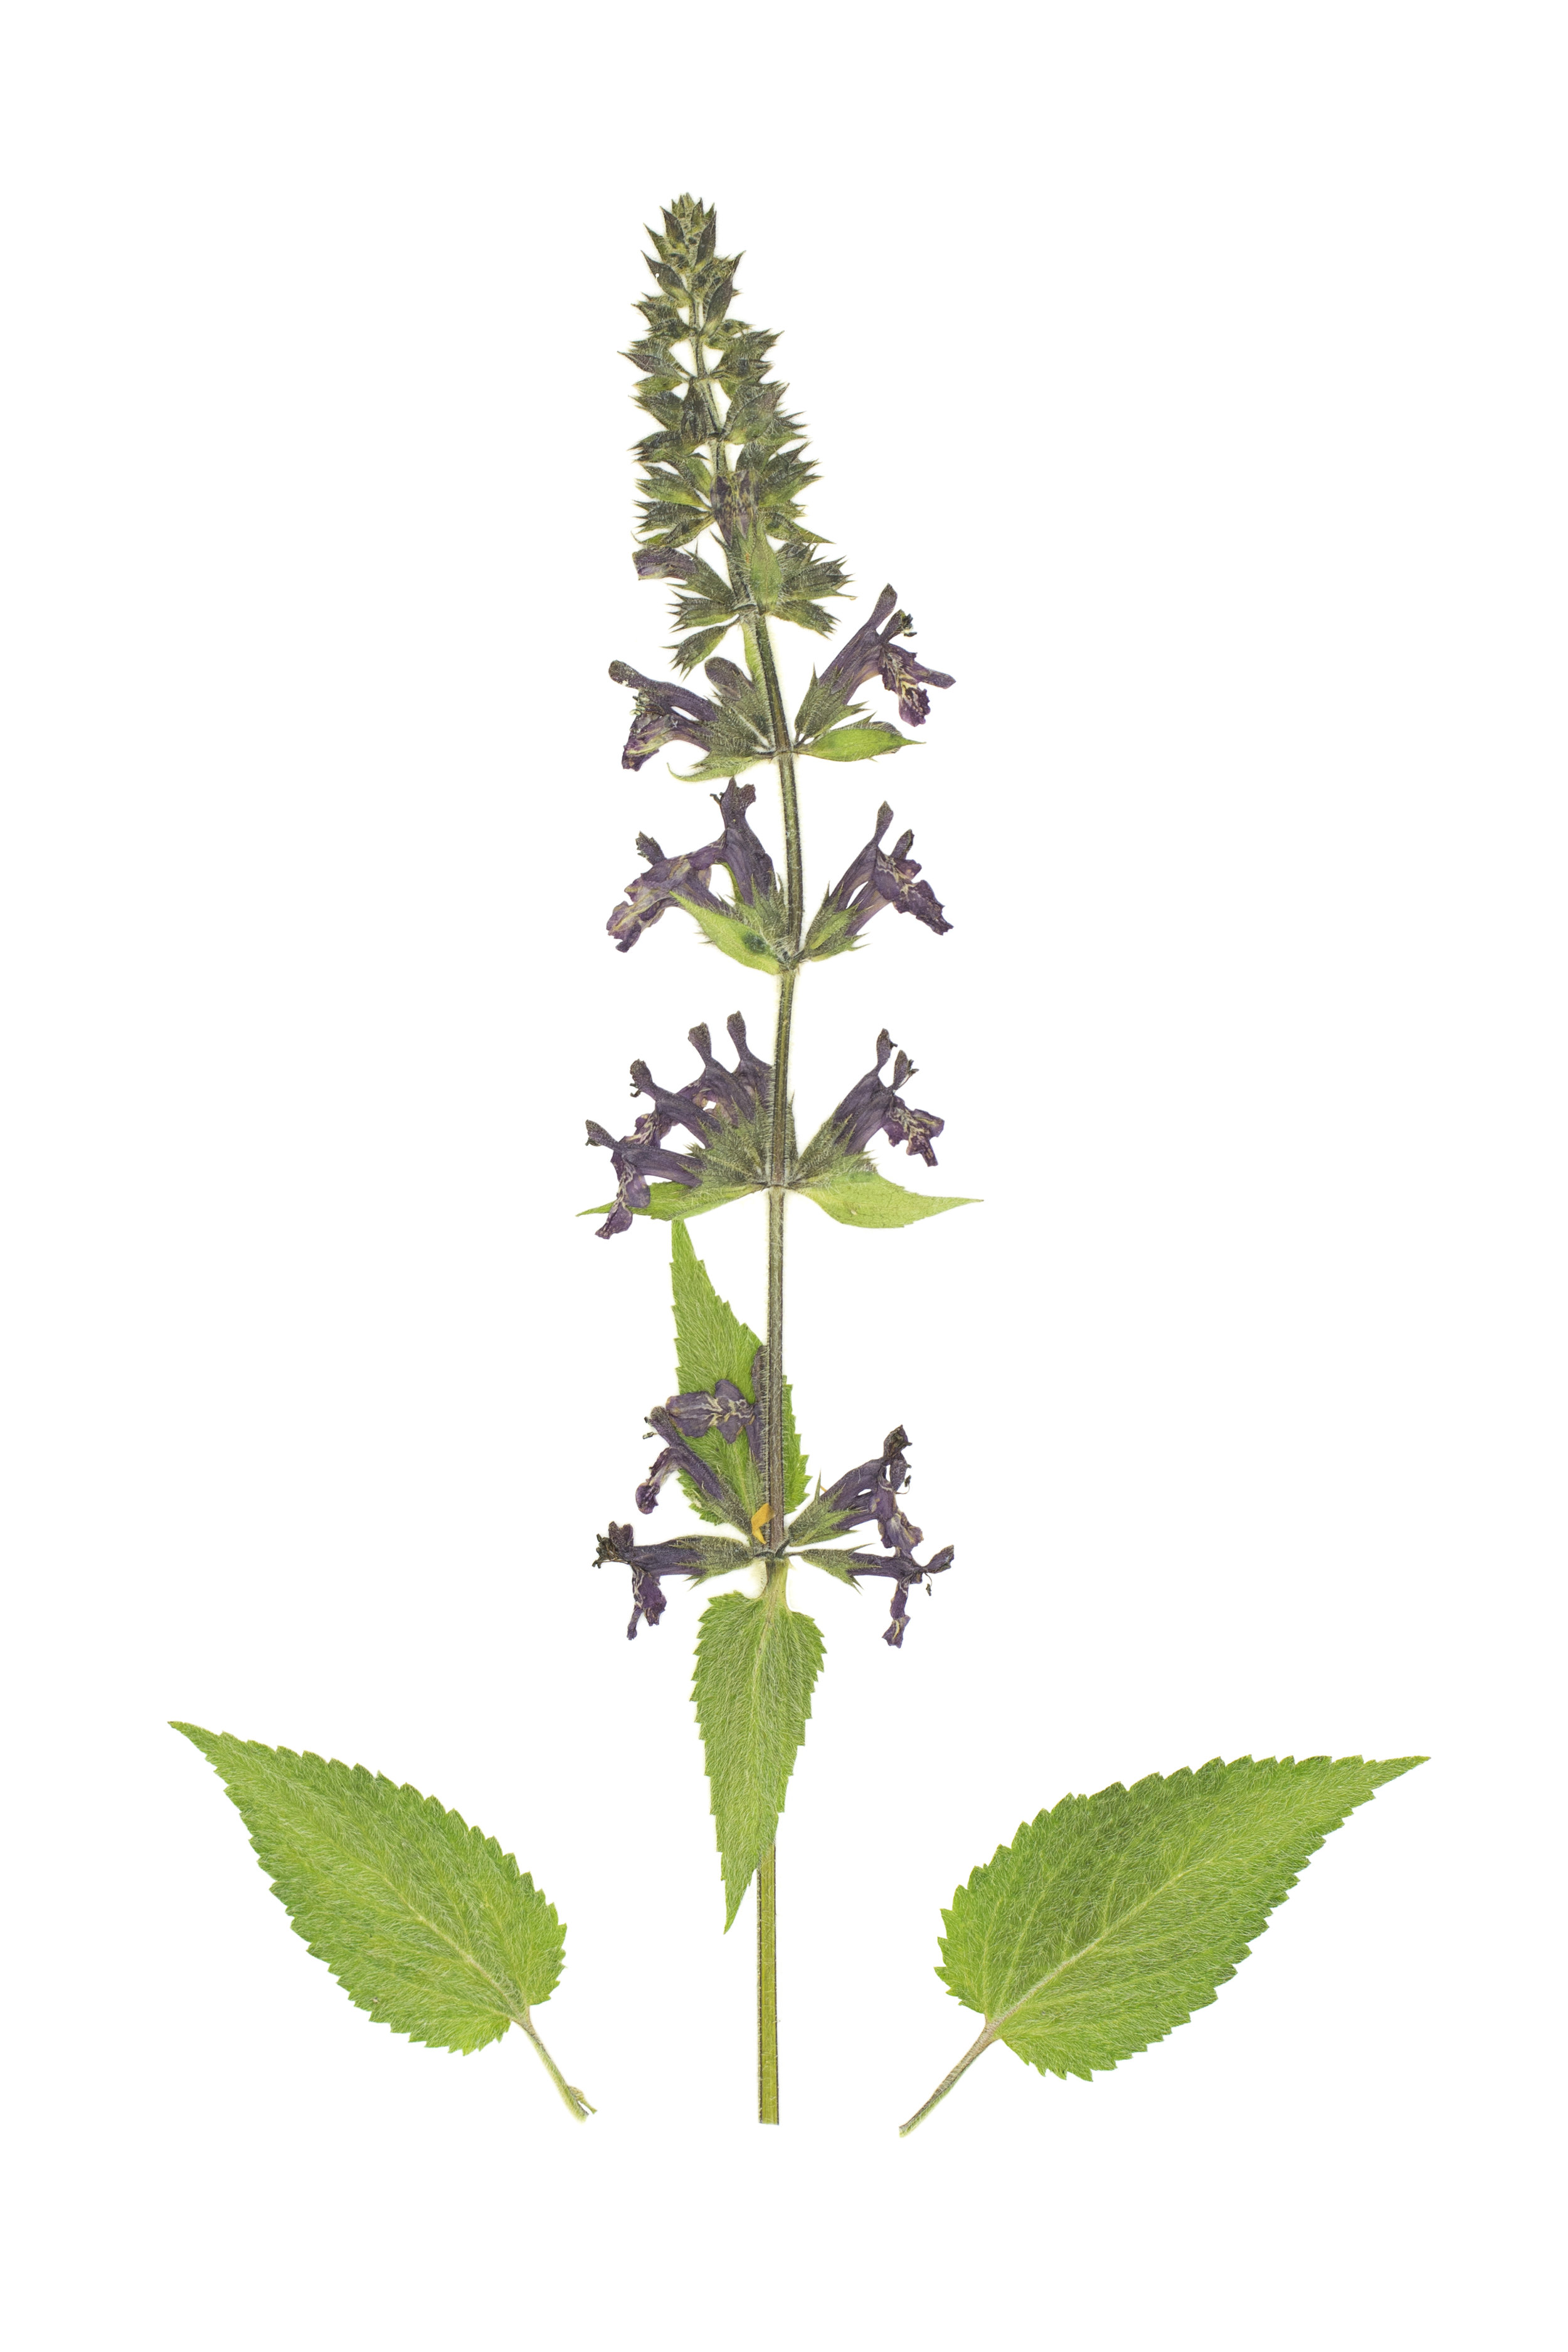 Hedge Woundwort/ Stachys sylvatica